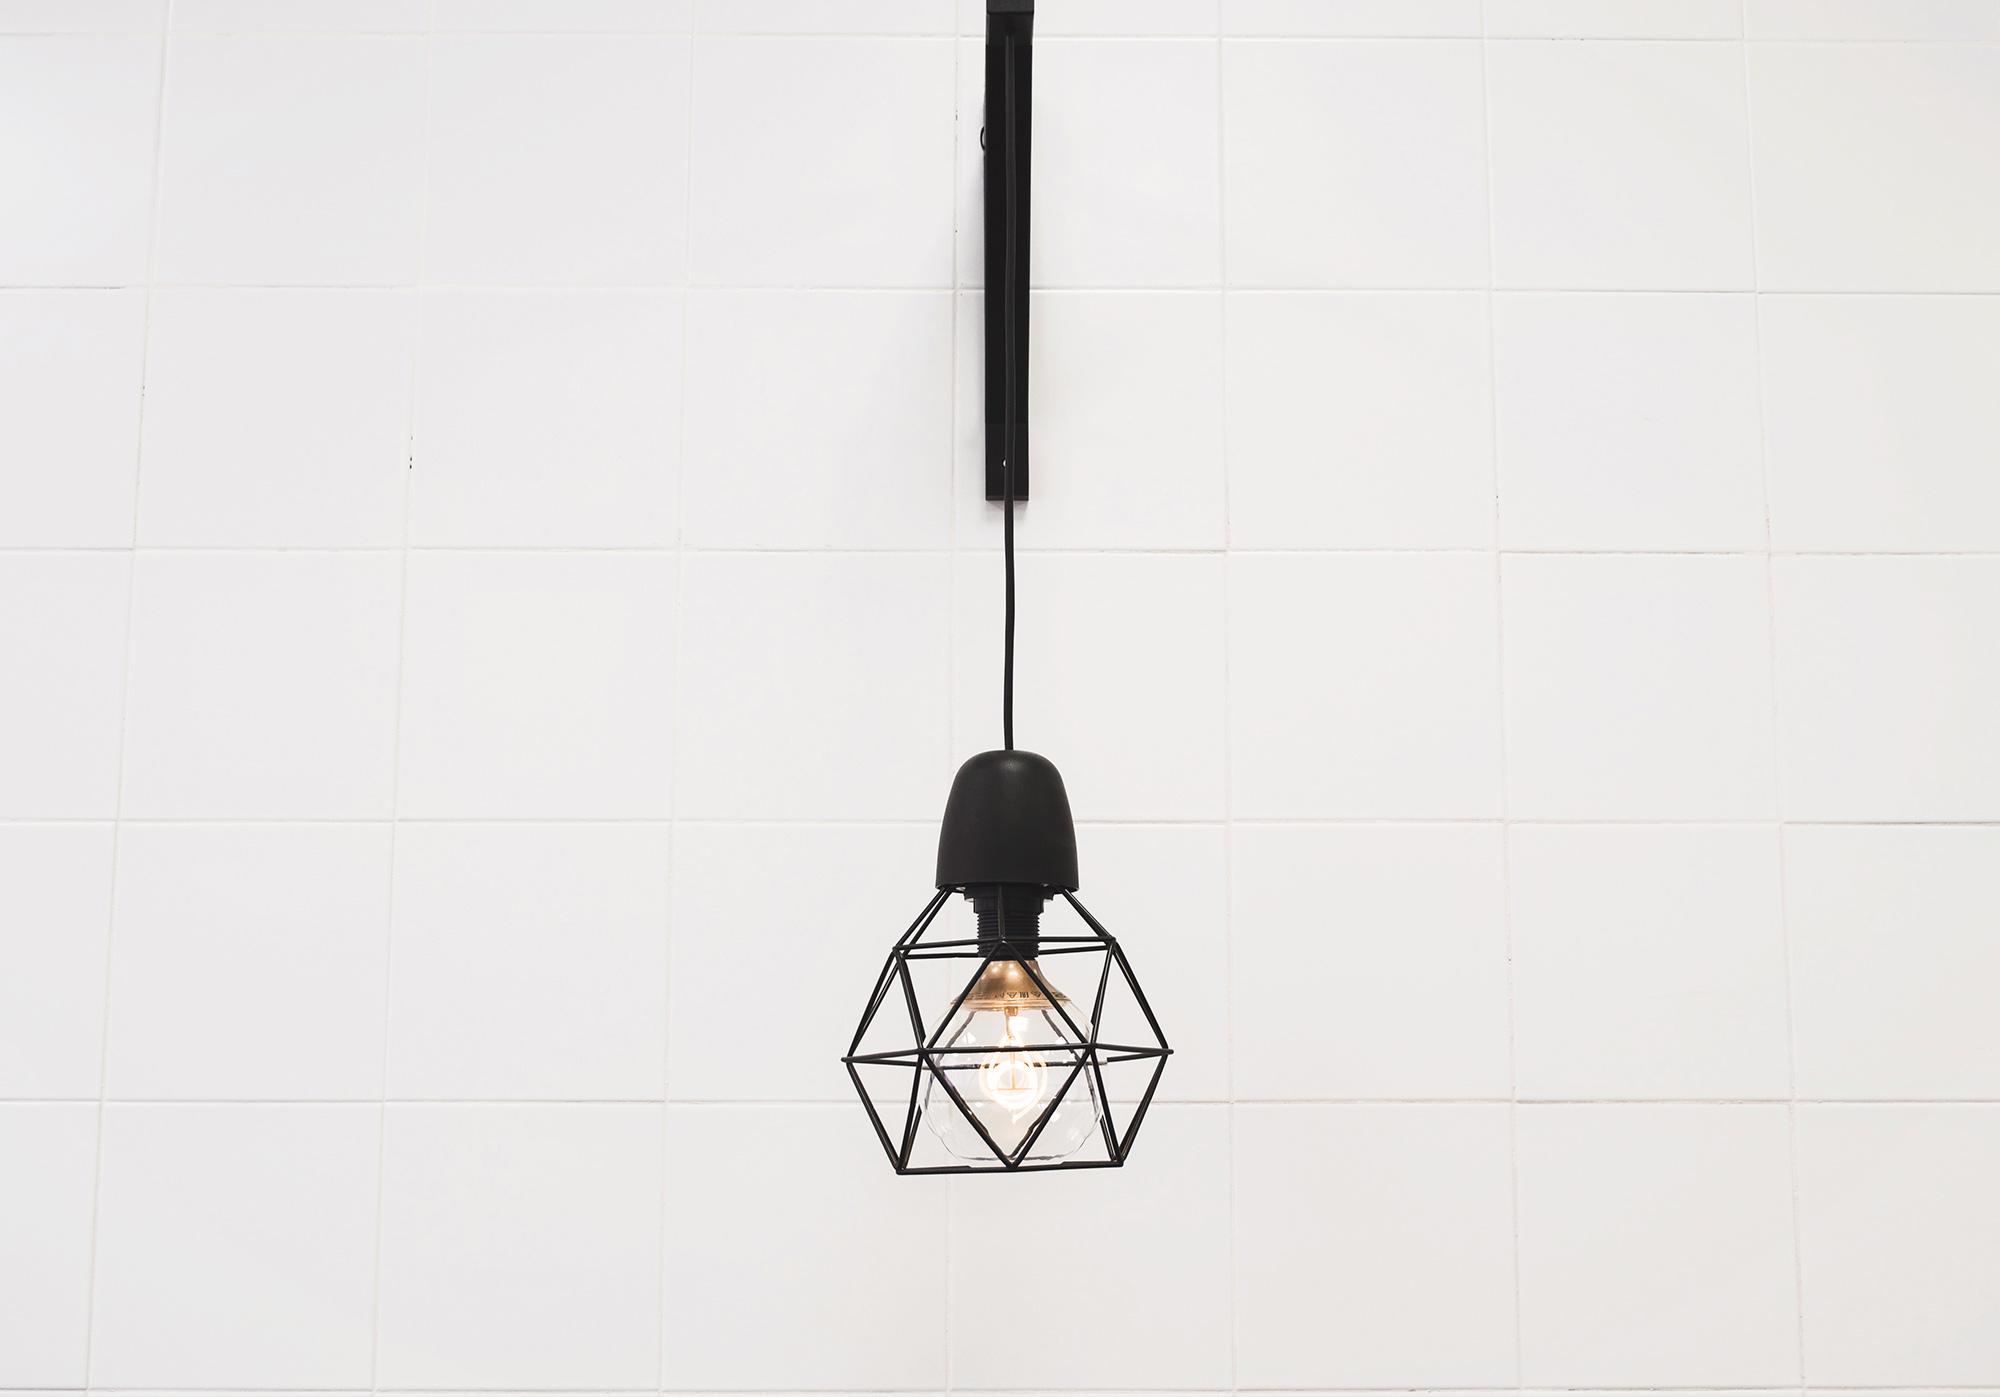 5 minimal-unsplash-photo-industrial-light-white-brick-wall.jpg